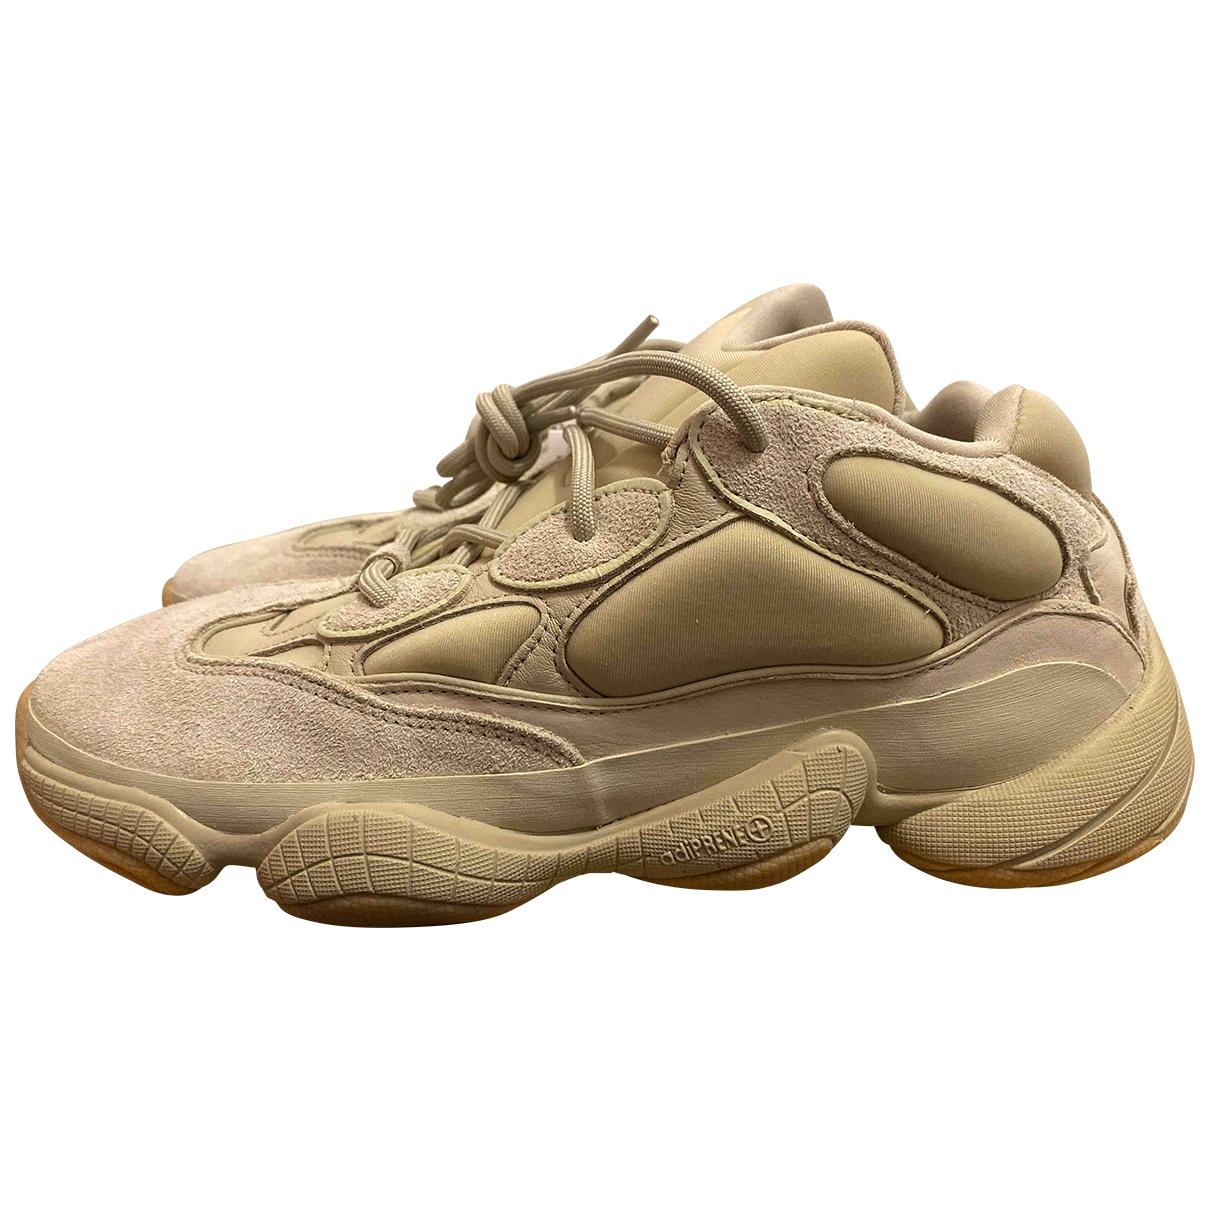 Yeezy X Adidas - Baskets 500 pour homme en toile